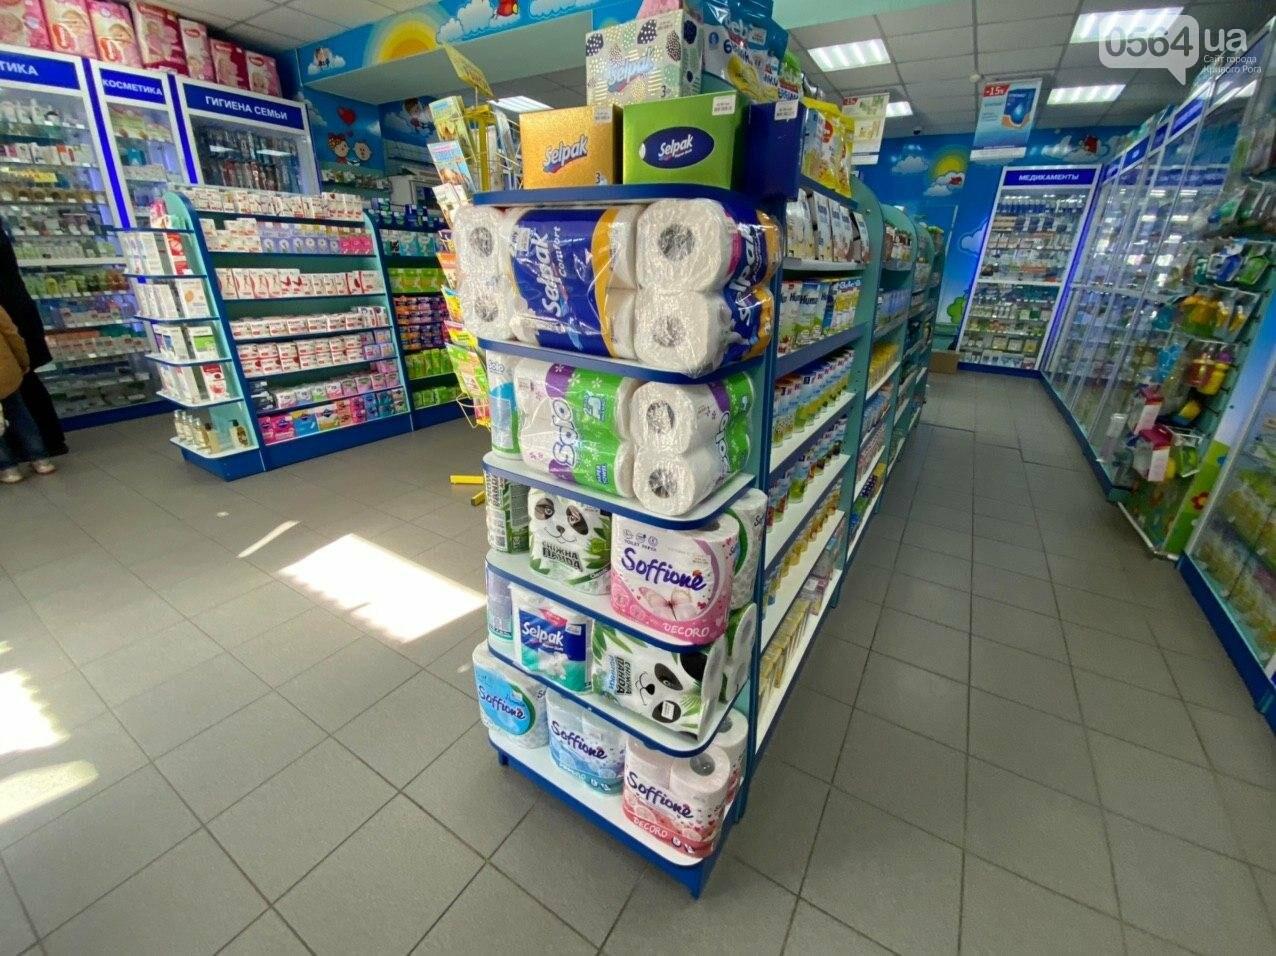 Туалетная бумага и гречка: что скупают криворожане во время карантина, - ФОТО , фото-11